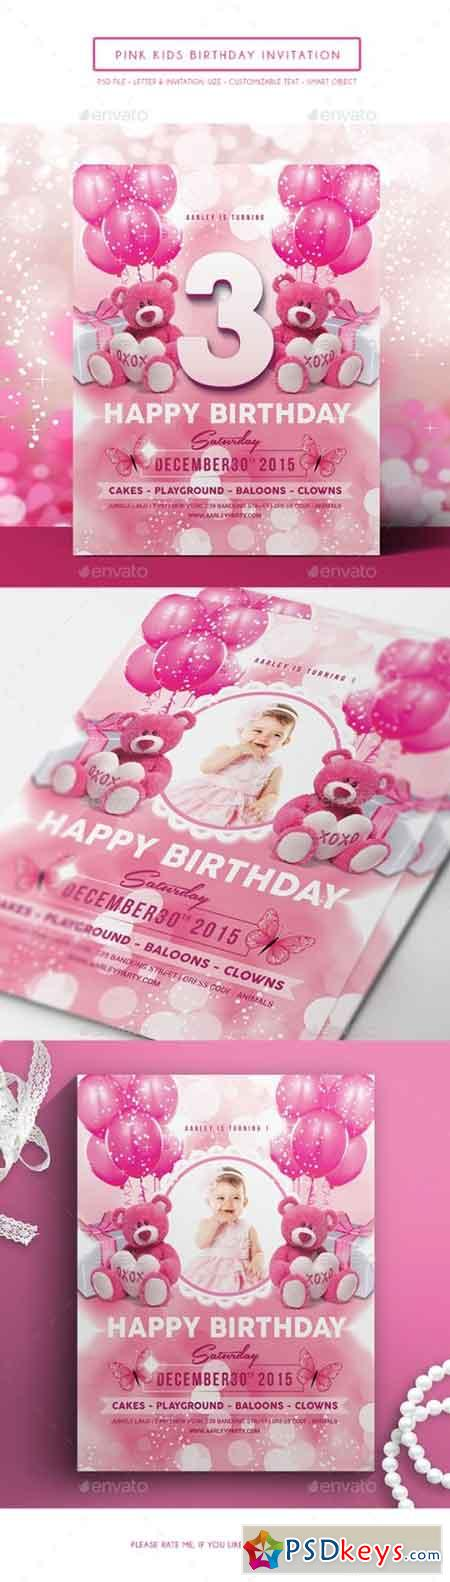 Pink Kids Birthday Invitation 14155317